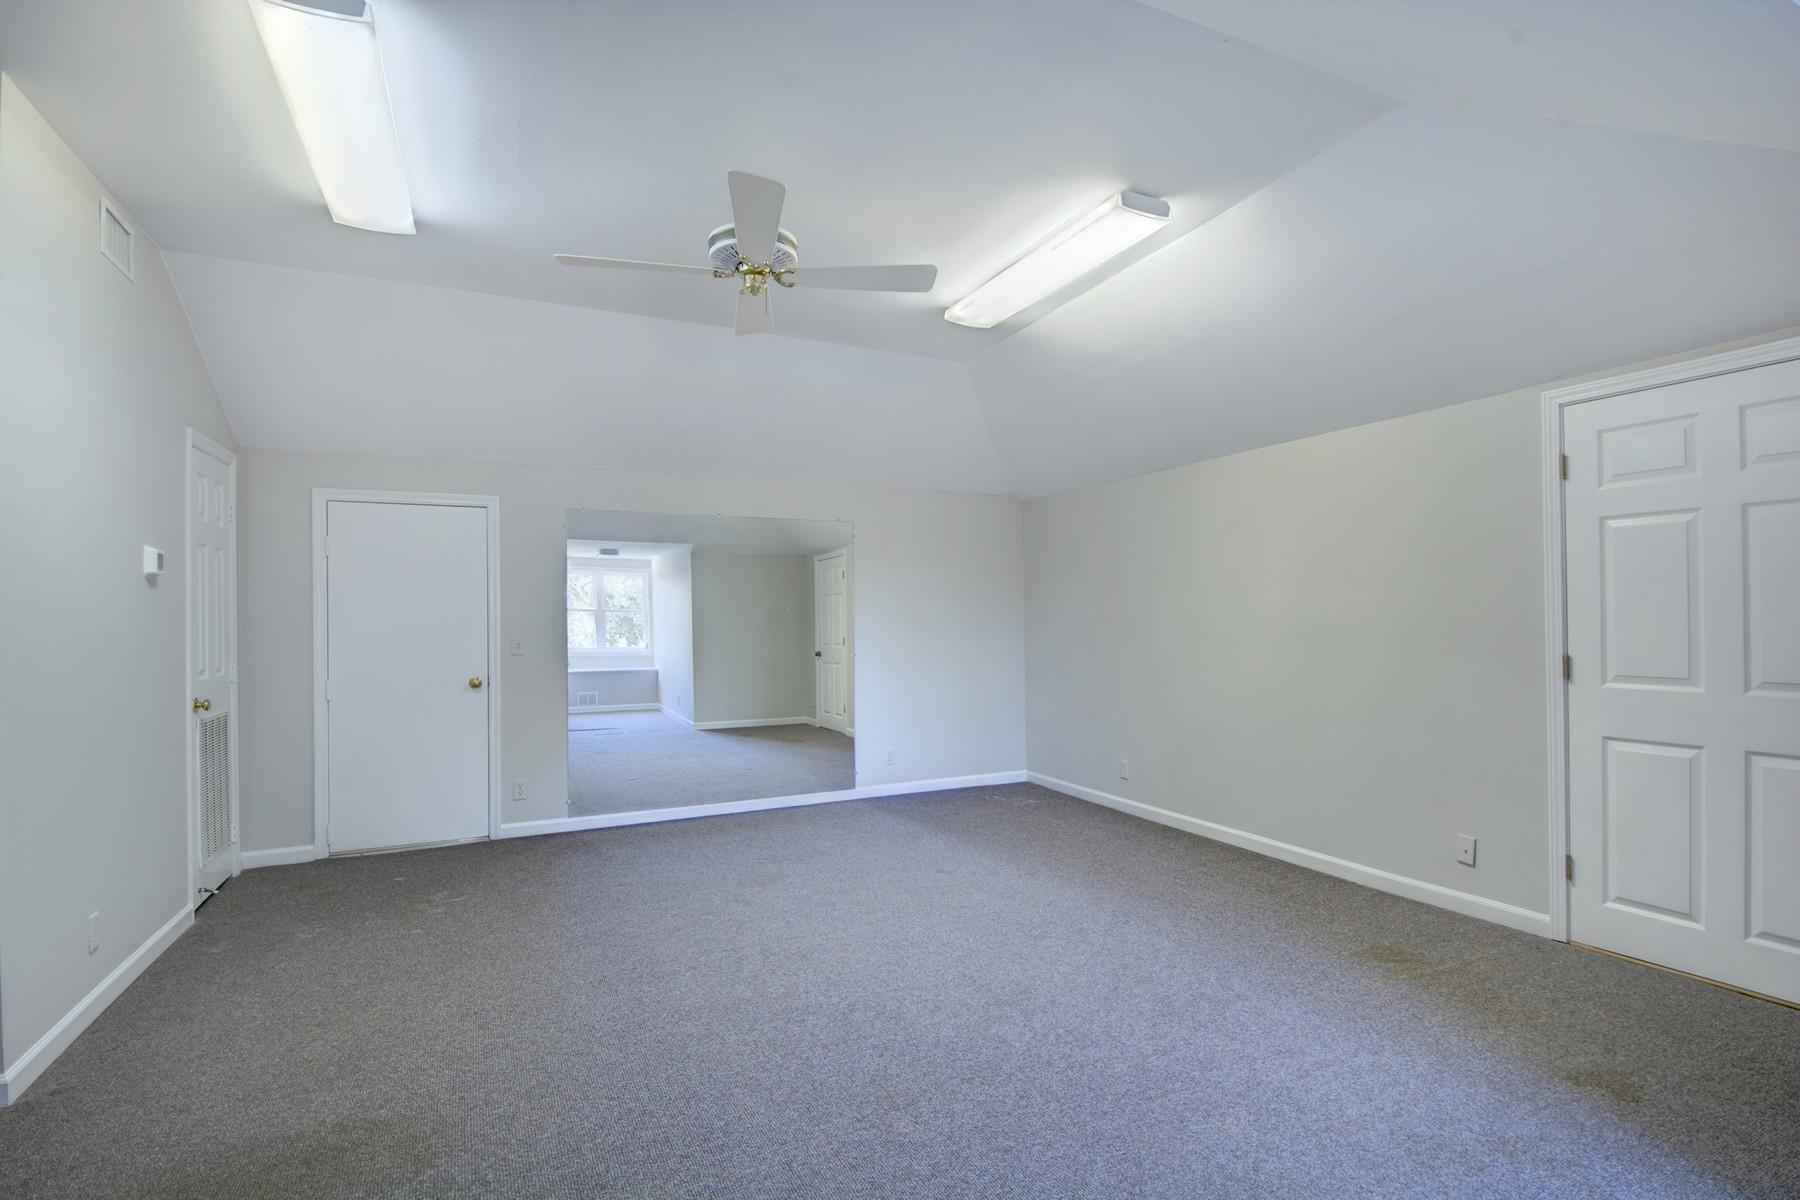 Additional photo for property listing at 146 Hampton Point Drive 146 Hampton Point Drive St. Simons Island, Georgië 31522 Verenigde Staten